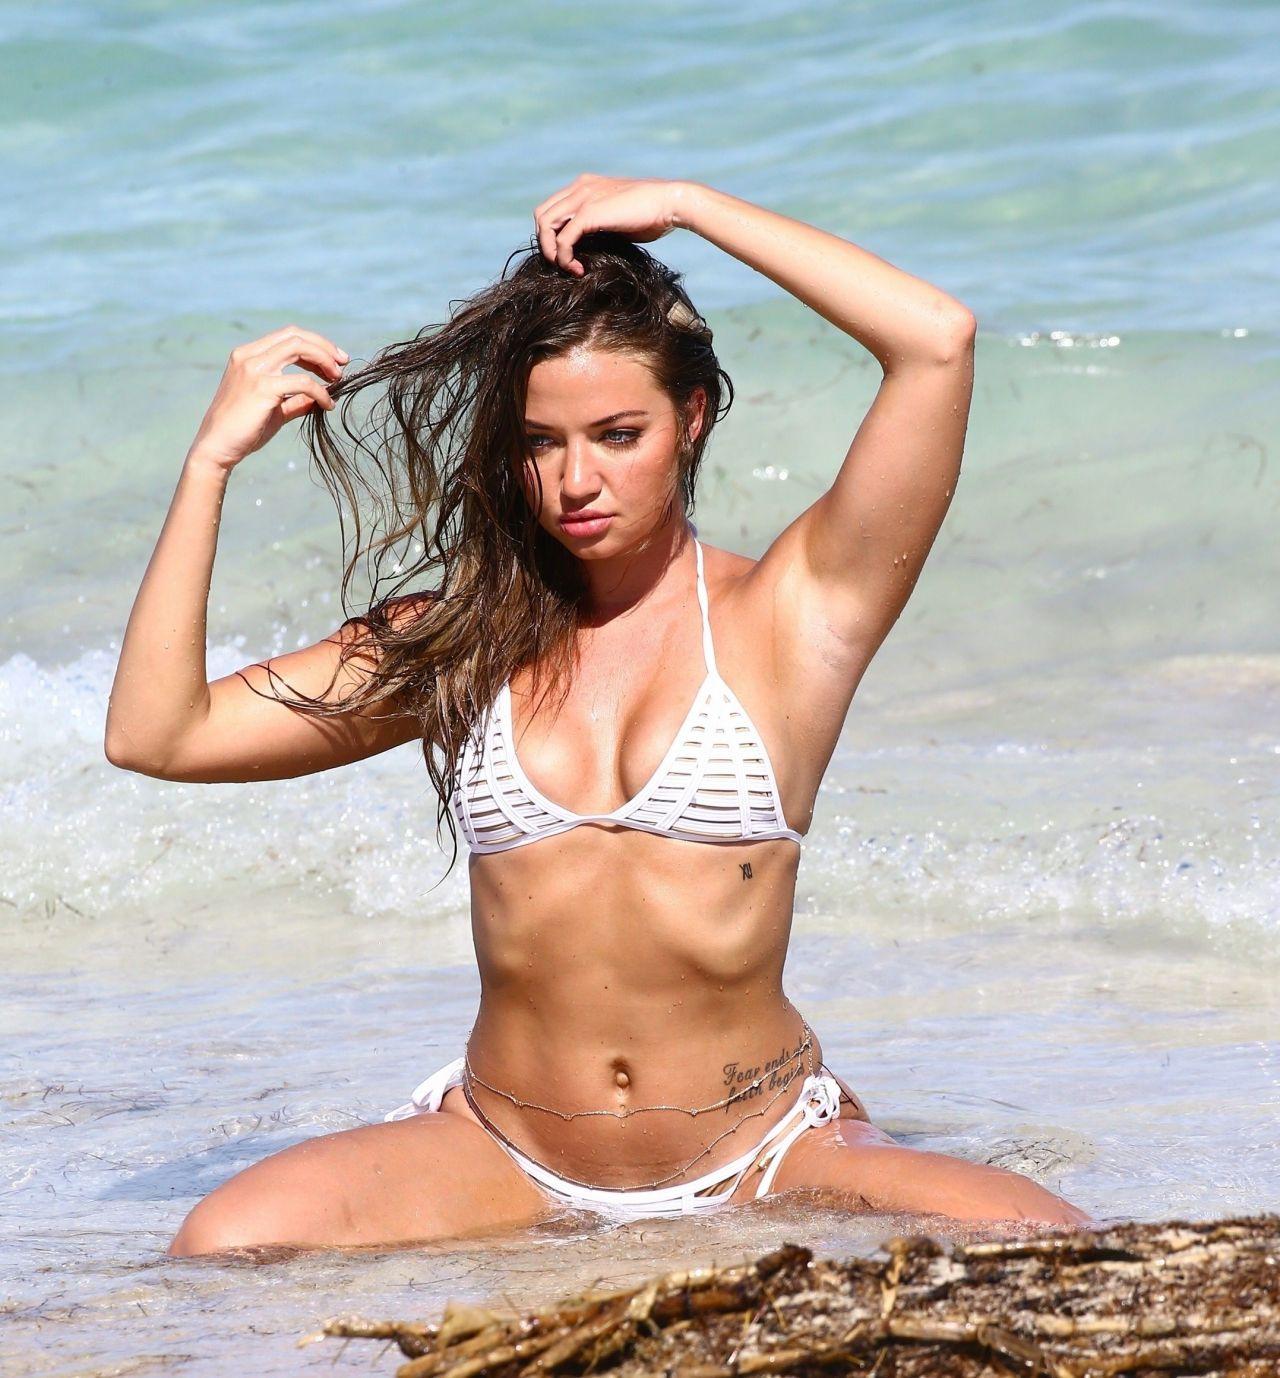 Erika Costell Bikini Photoshoot - Miami Beach 09/01/2017